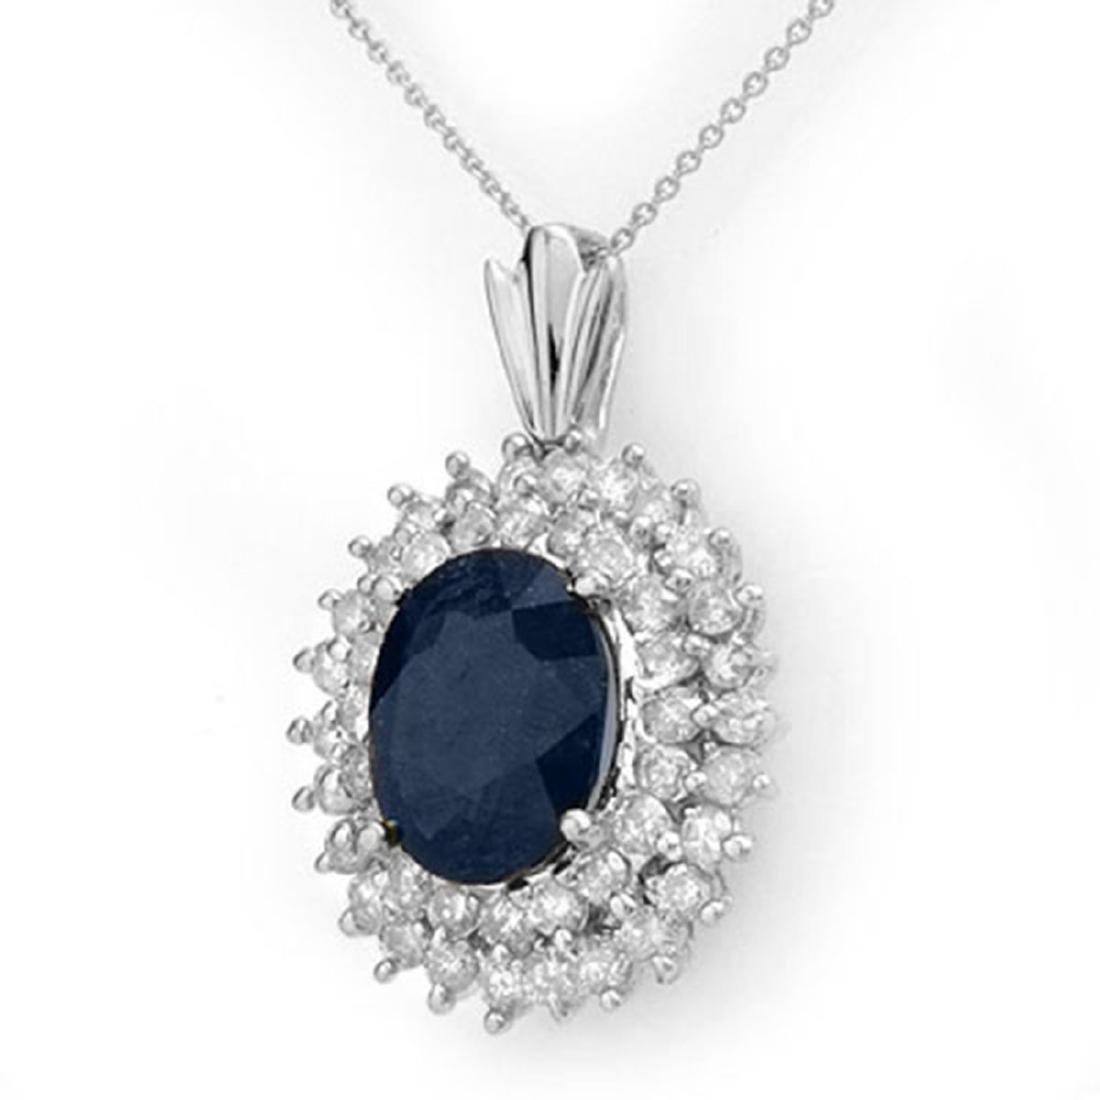 11.20 ctw Blue Sapphire & Diamond Pendant 18K White